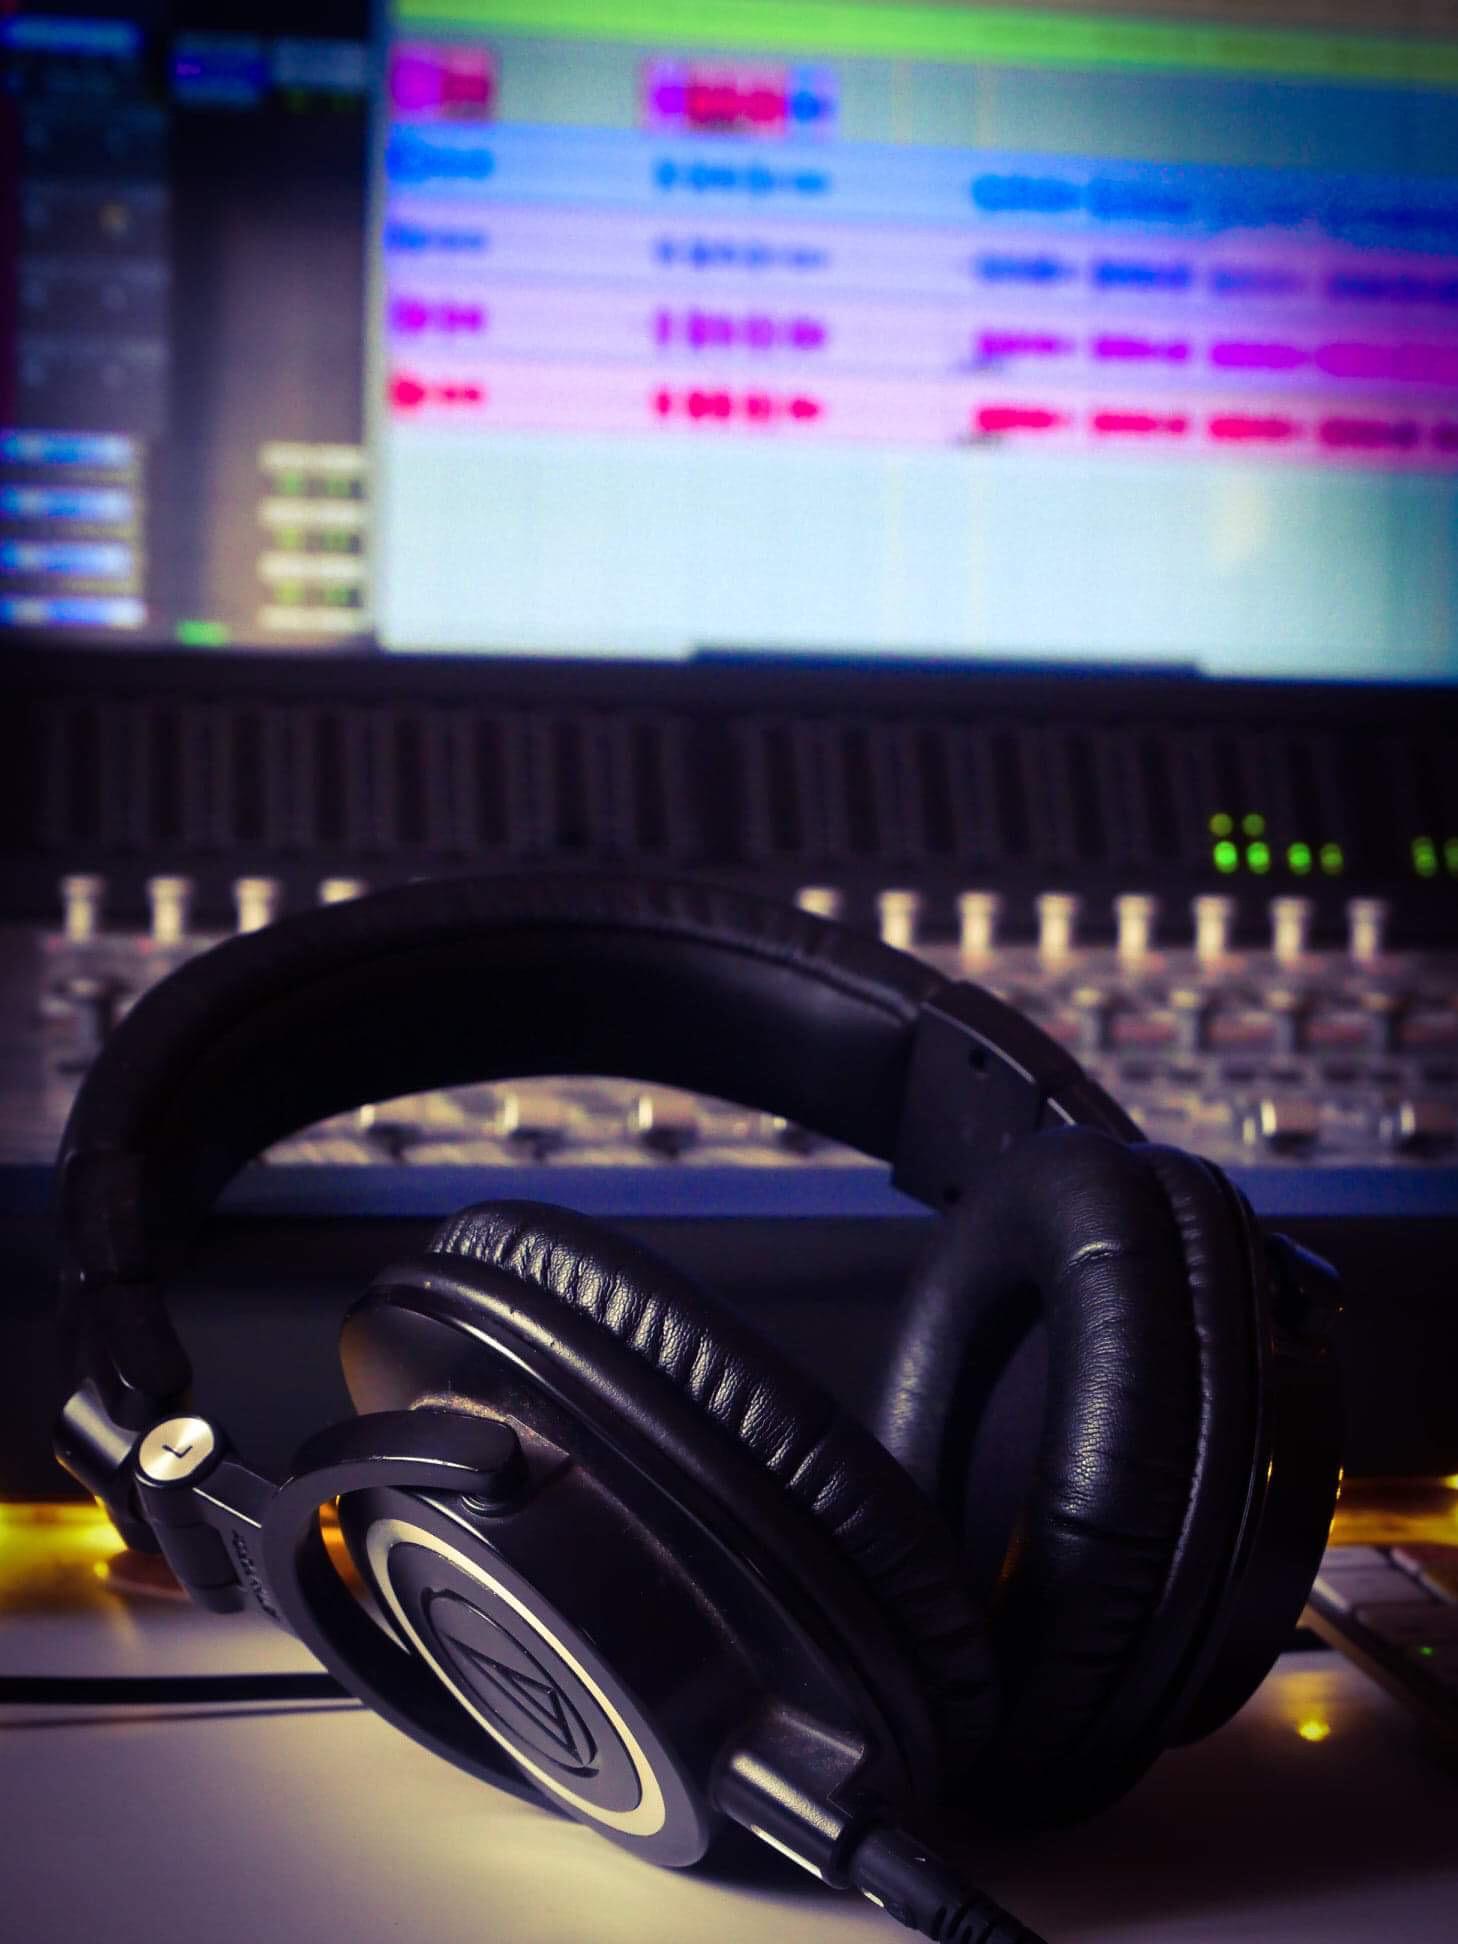 casque audio technica écran console de mixage protools